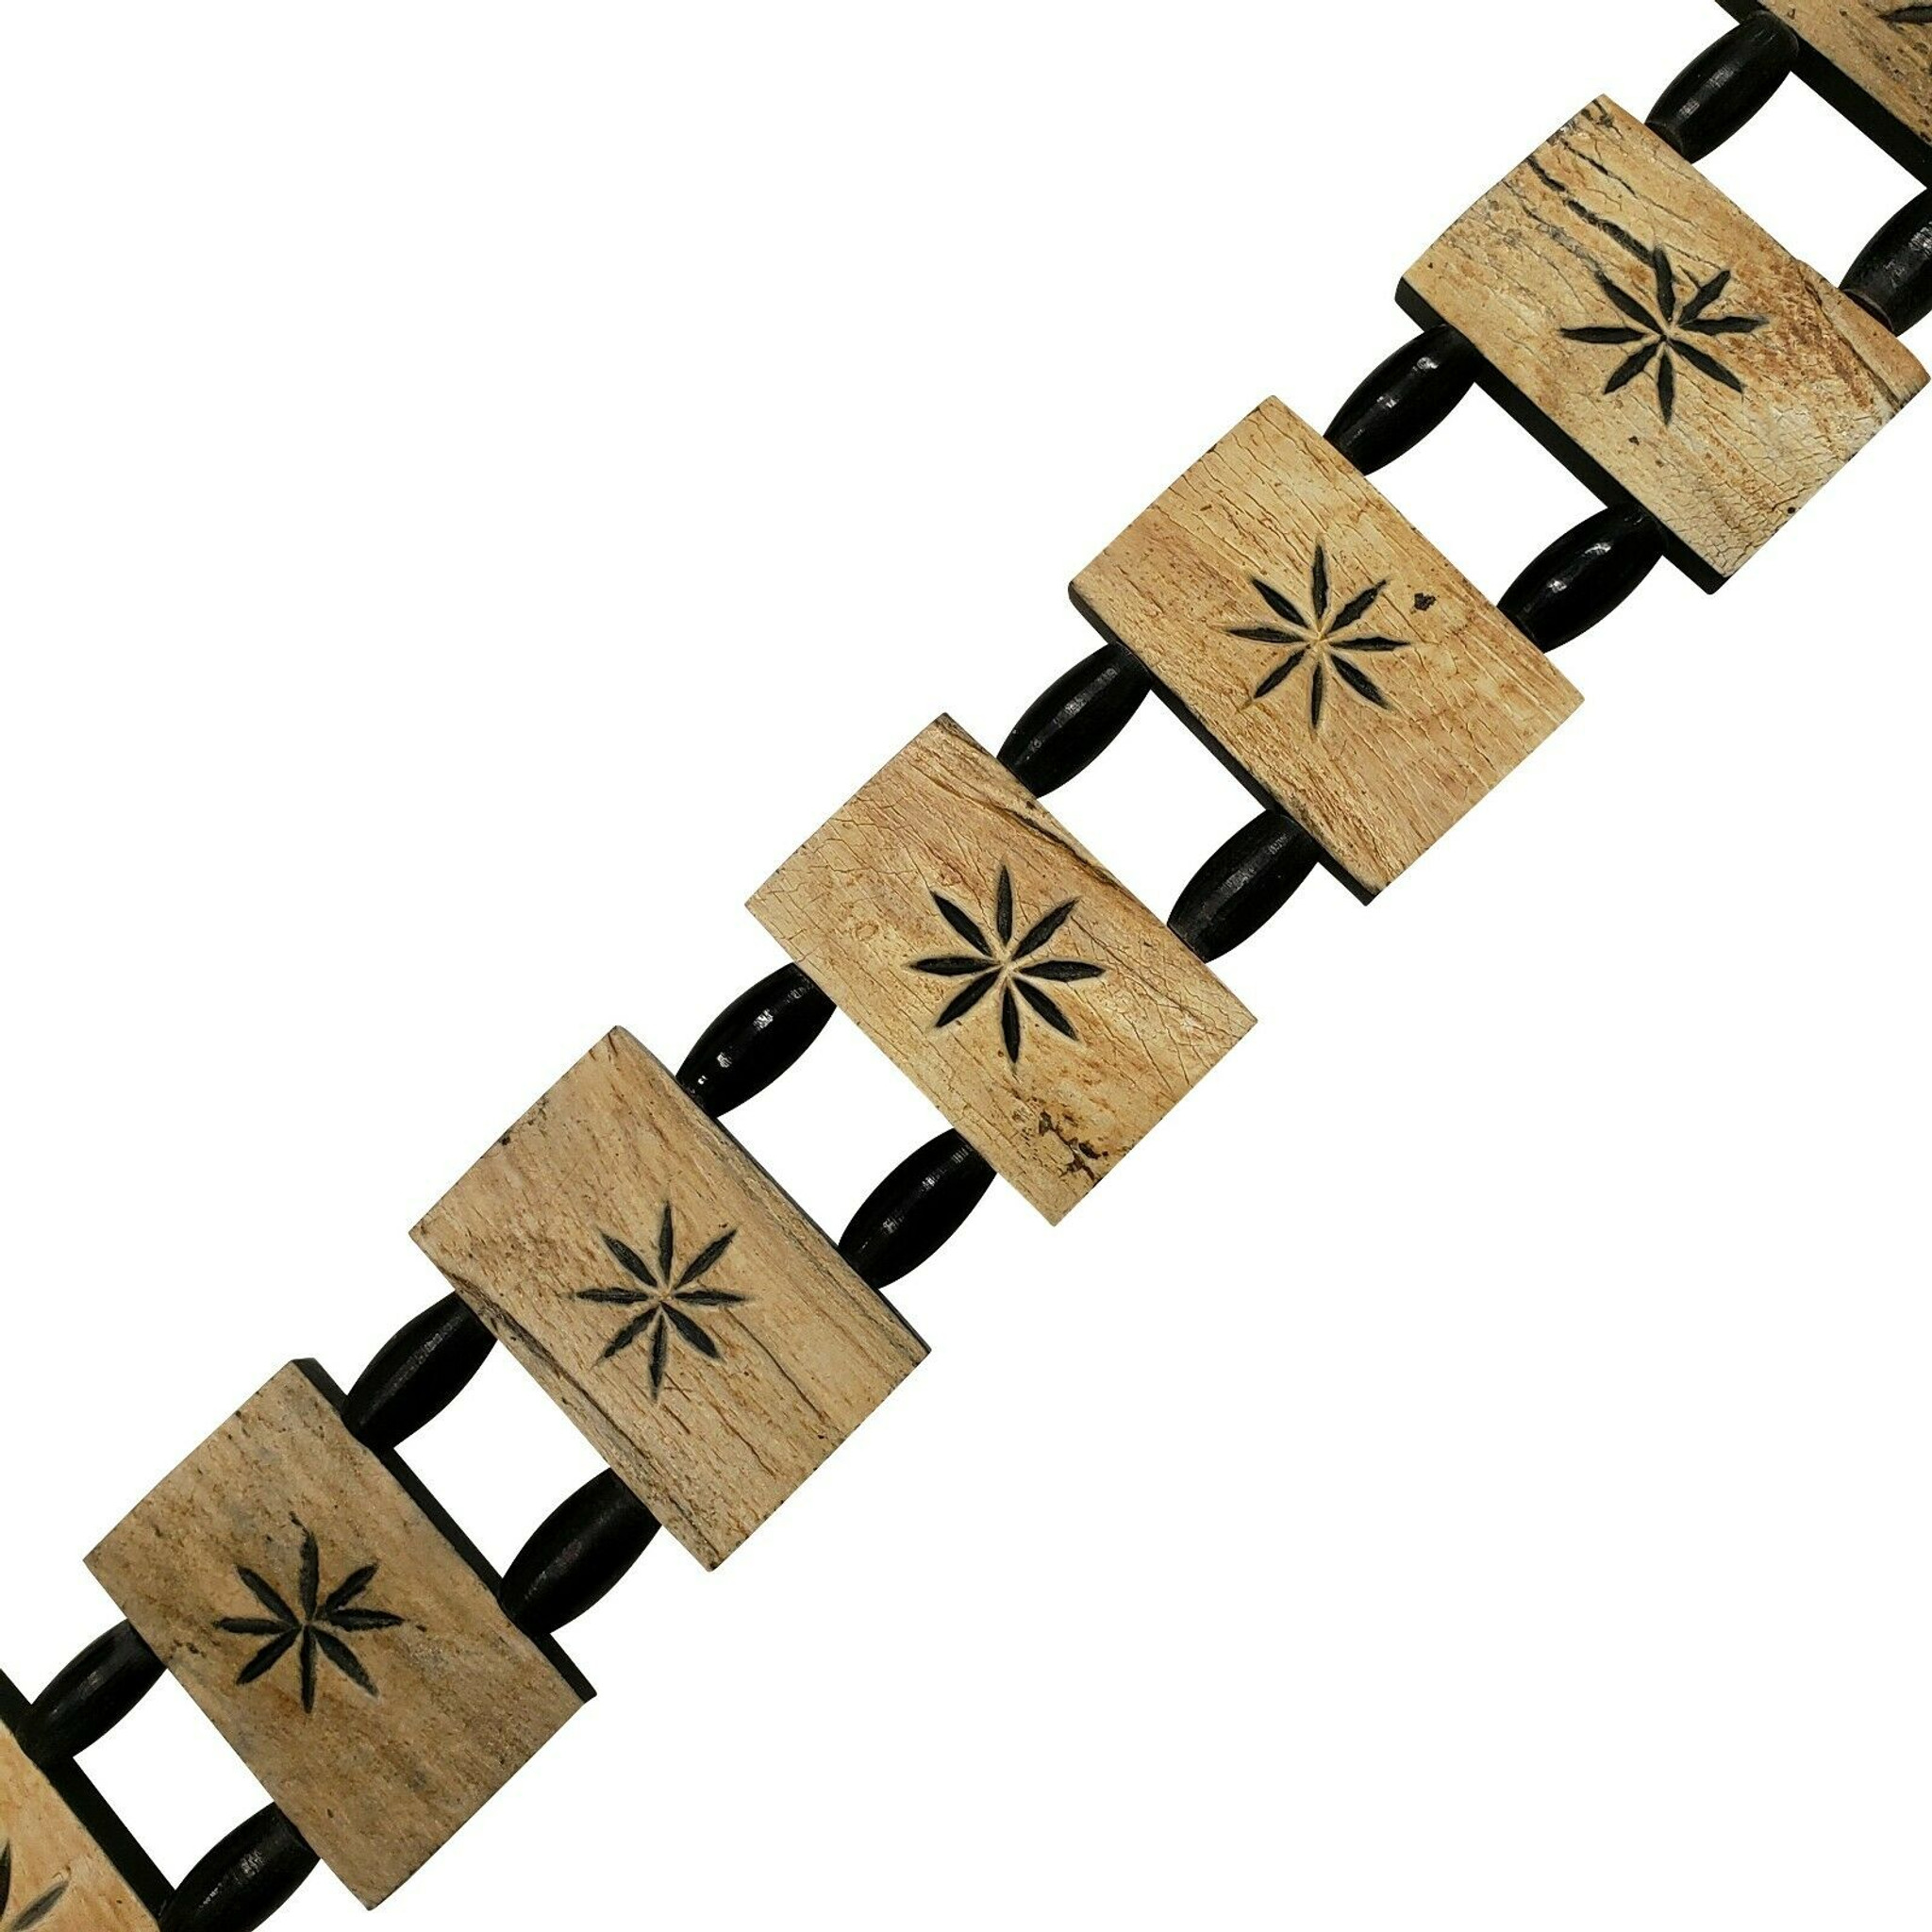 Shani Buffalo Horn Belt with Carved Flower Design